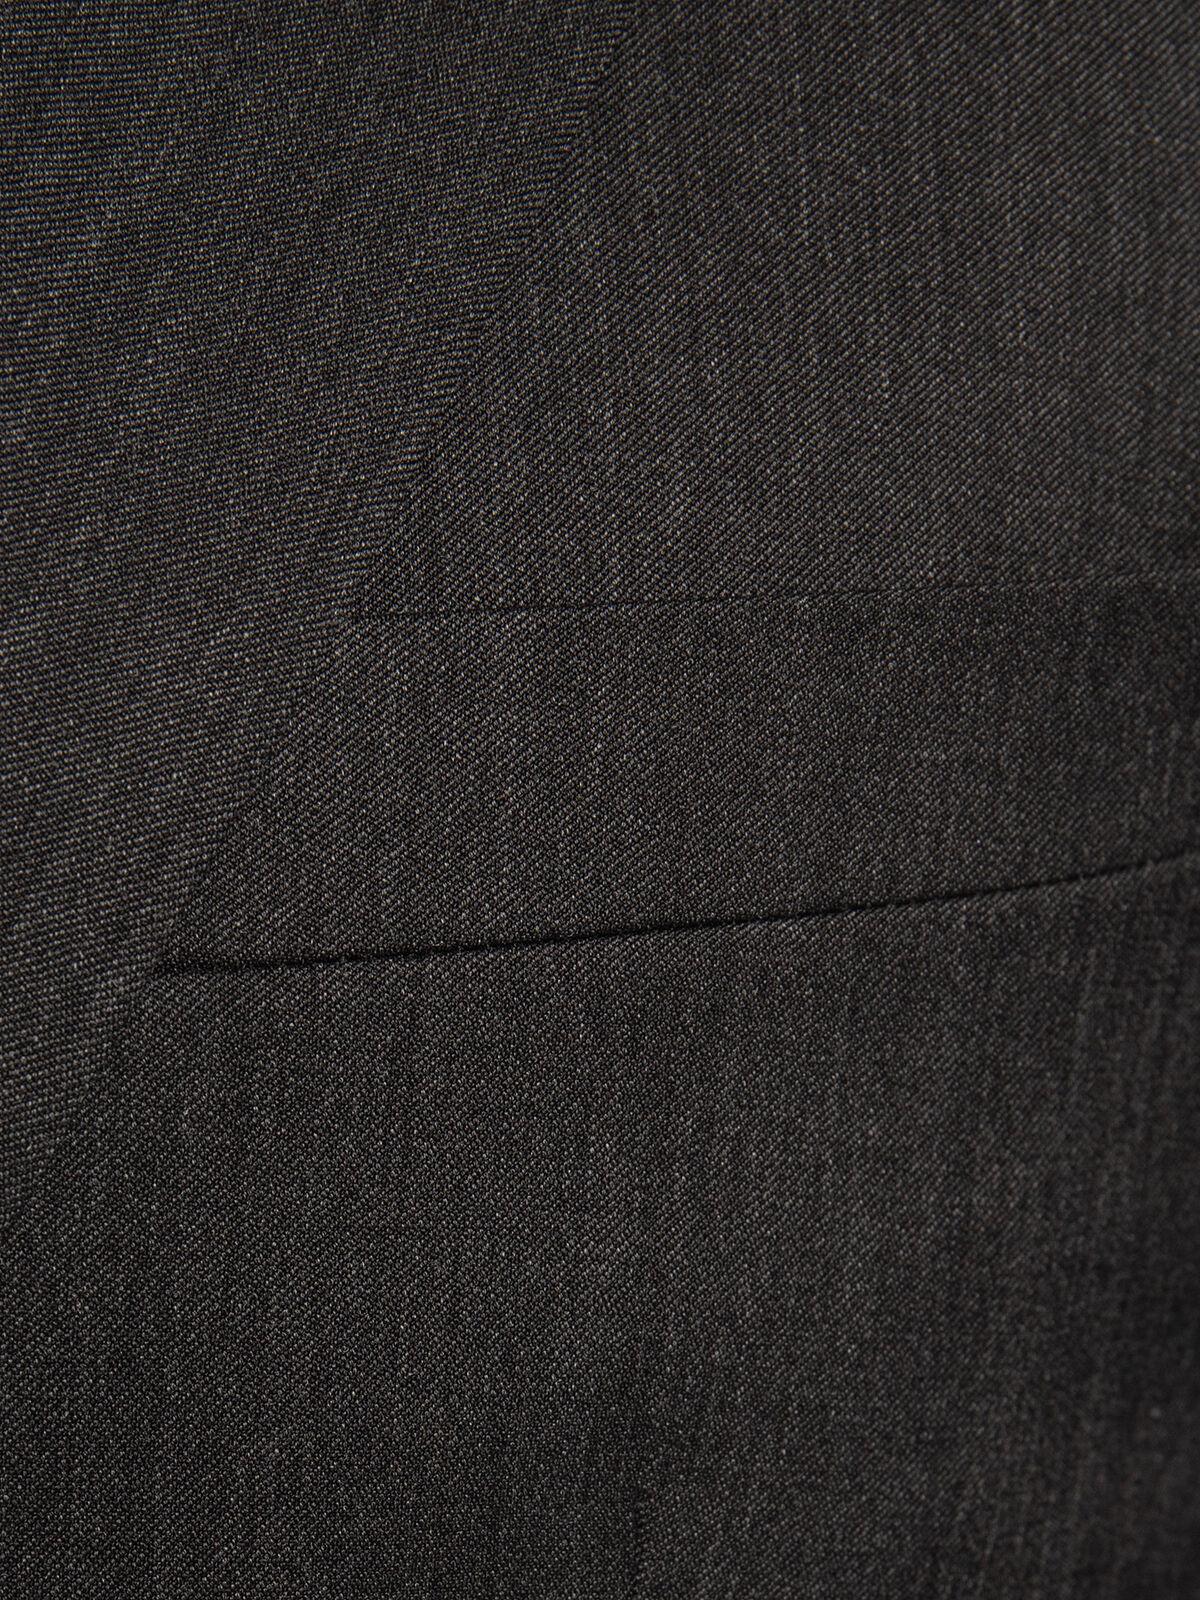 Veston à assortir coupe Regular Fit